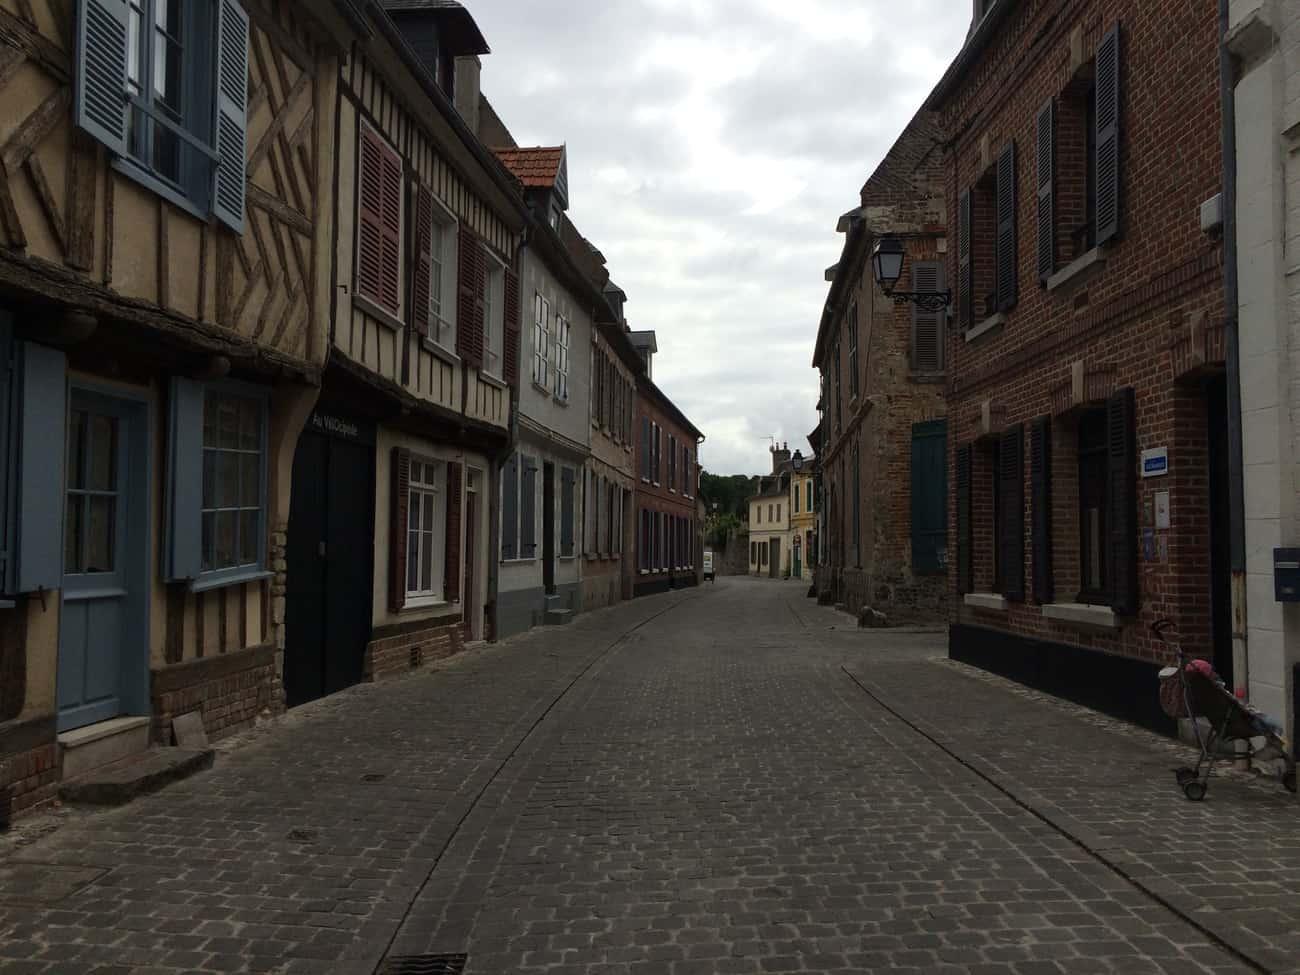 St Valery sur Somme - medieval city